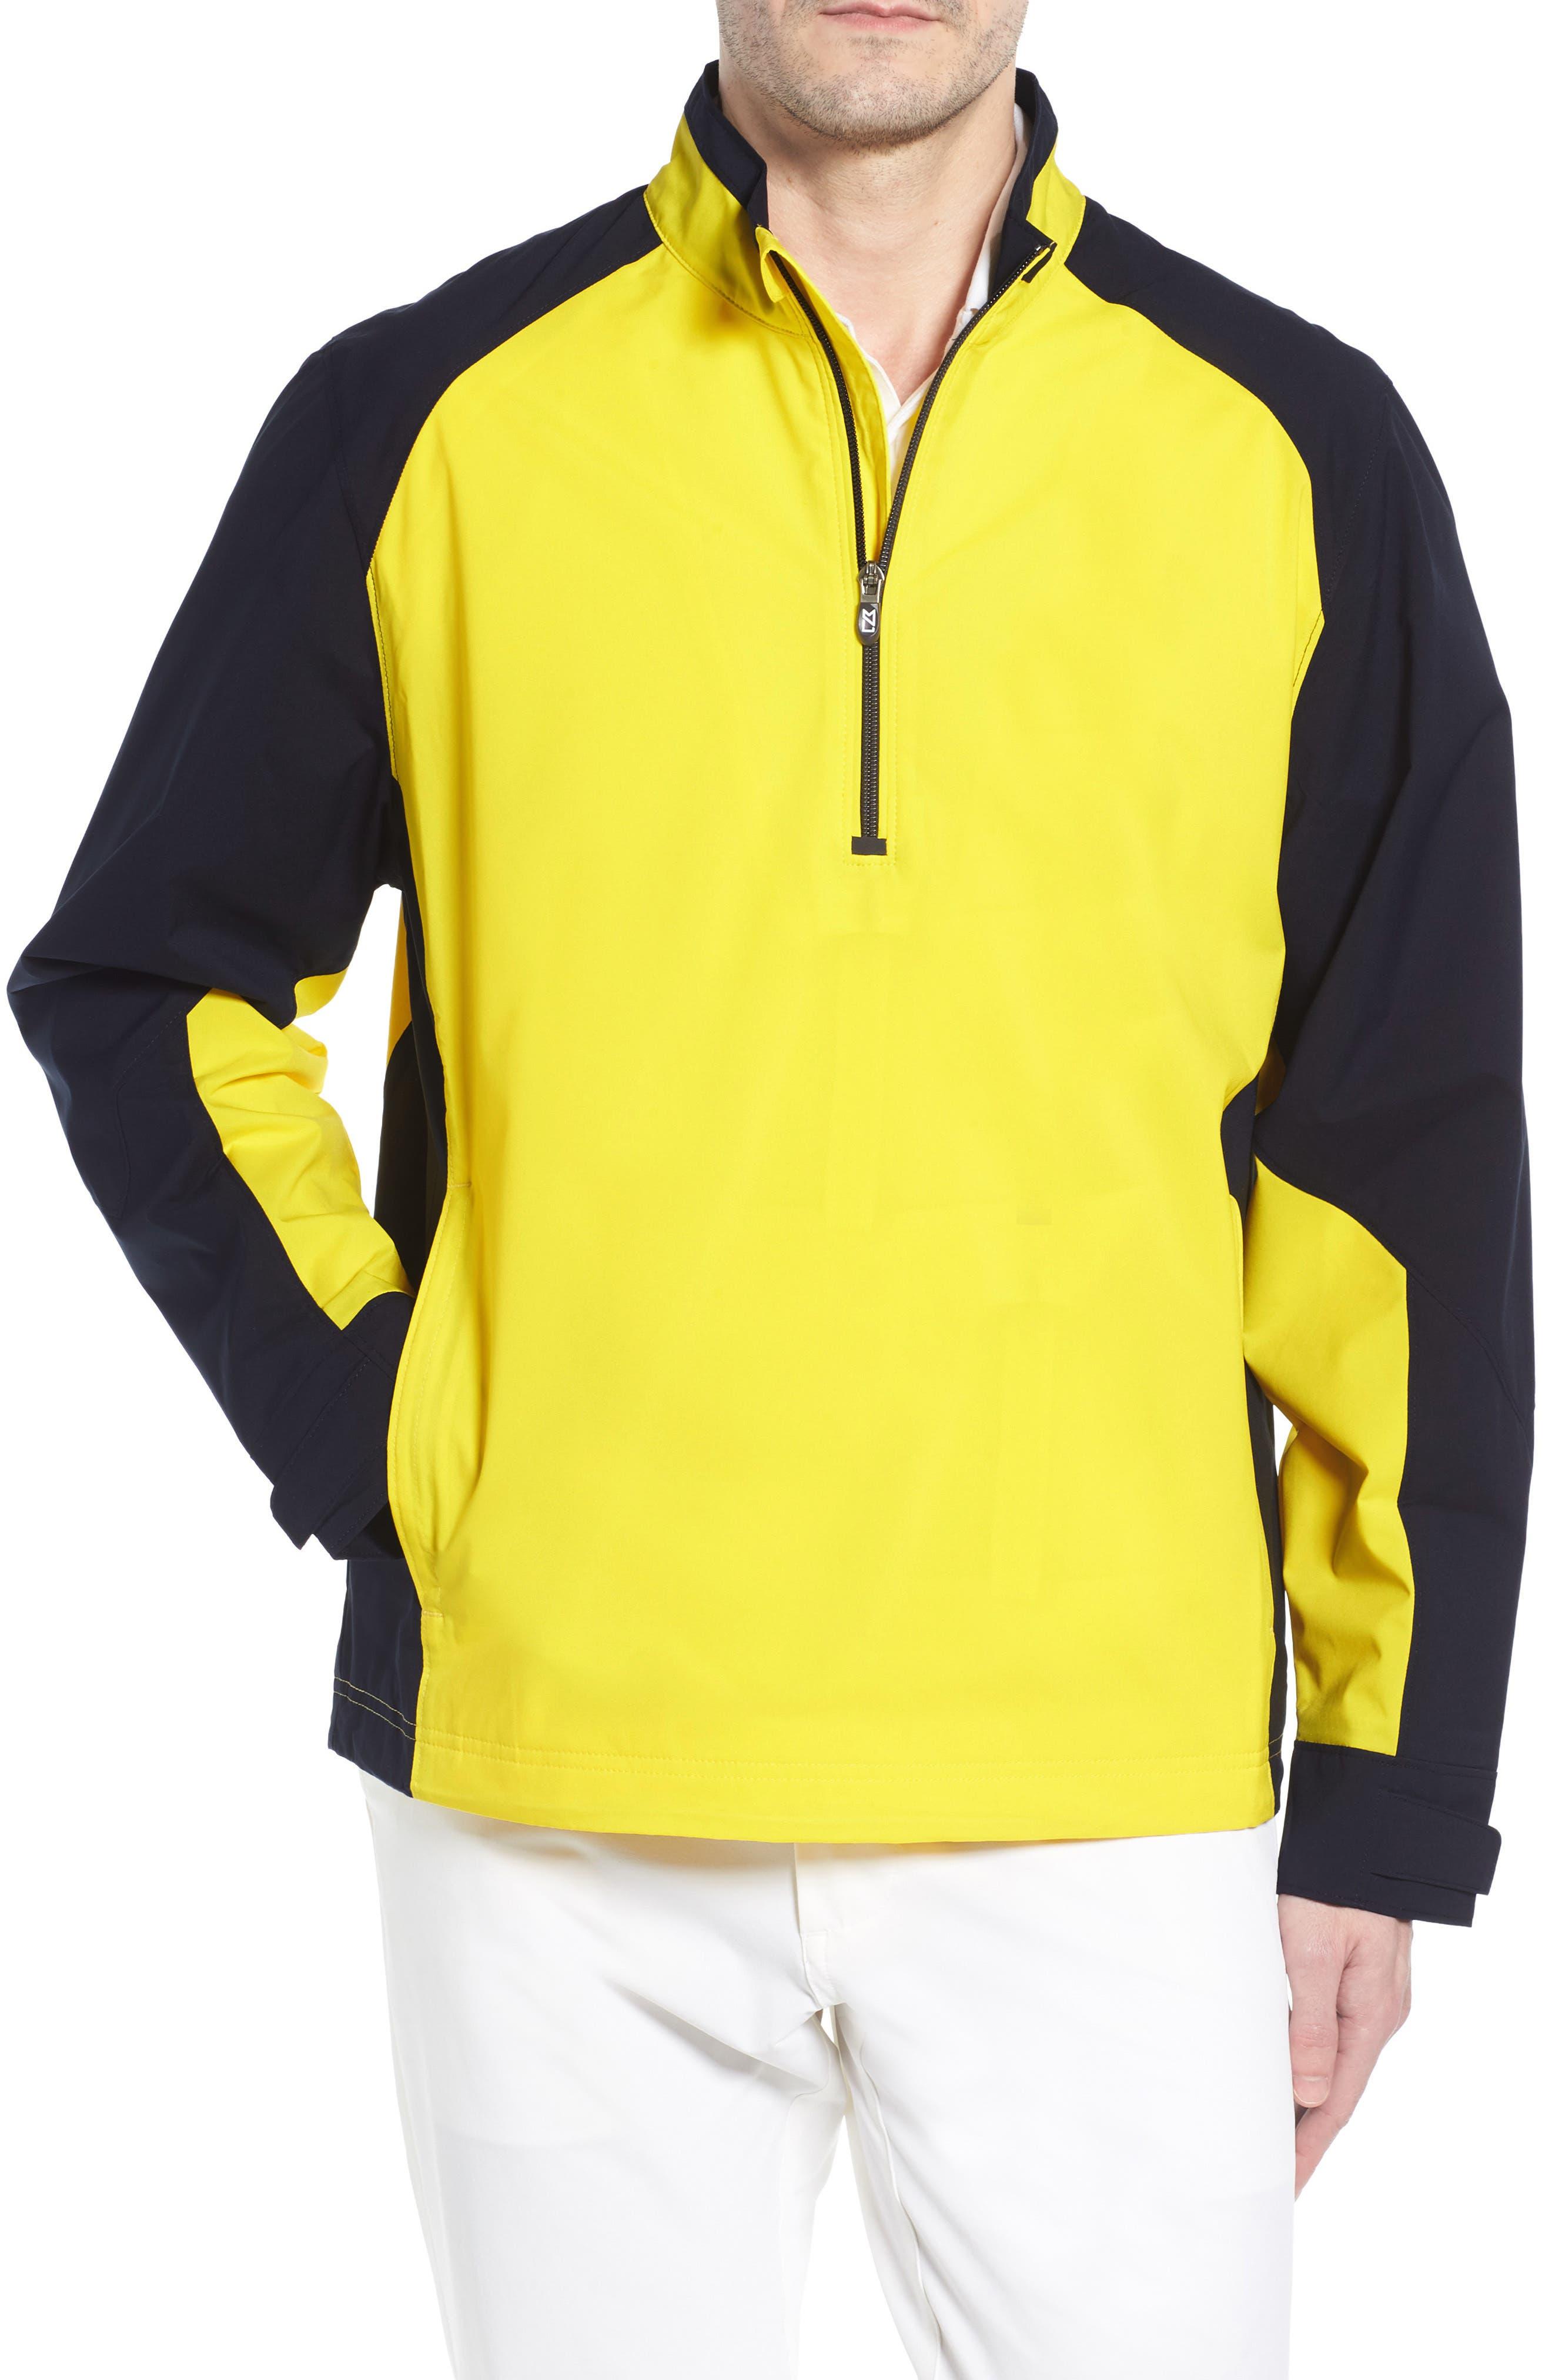 'Summit' WeatherTec Wind & Water Resistant Half Zip Jacket, Main, color, GALAXY